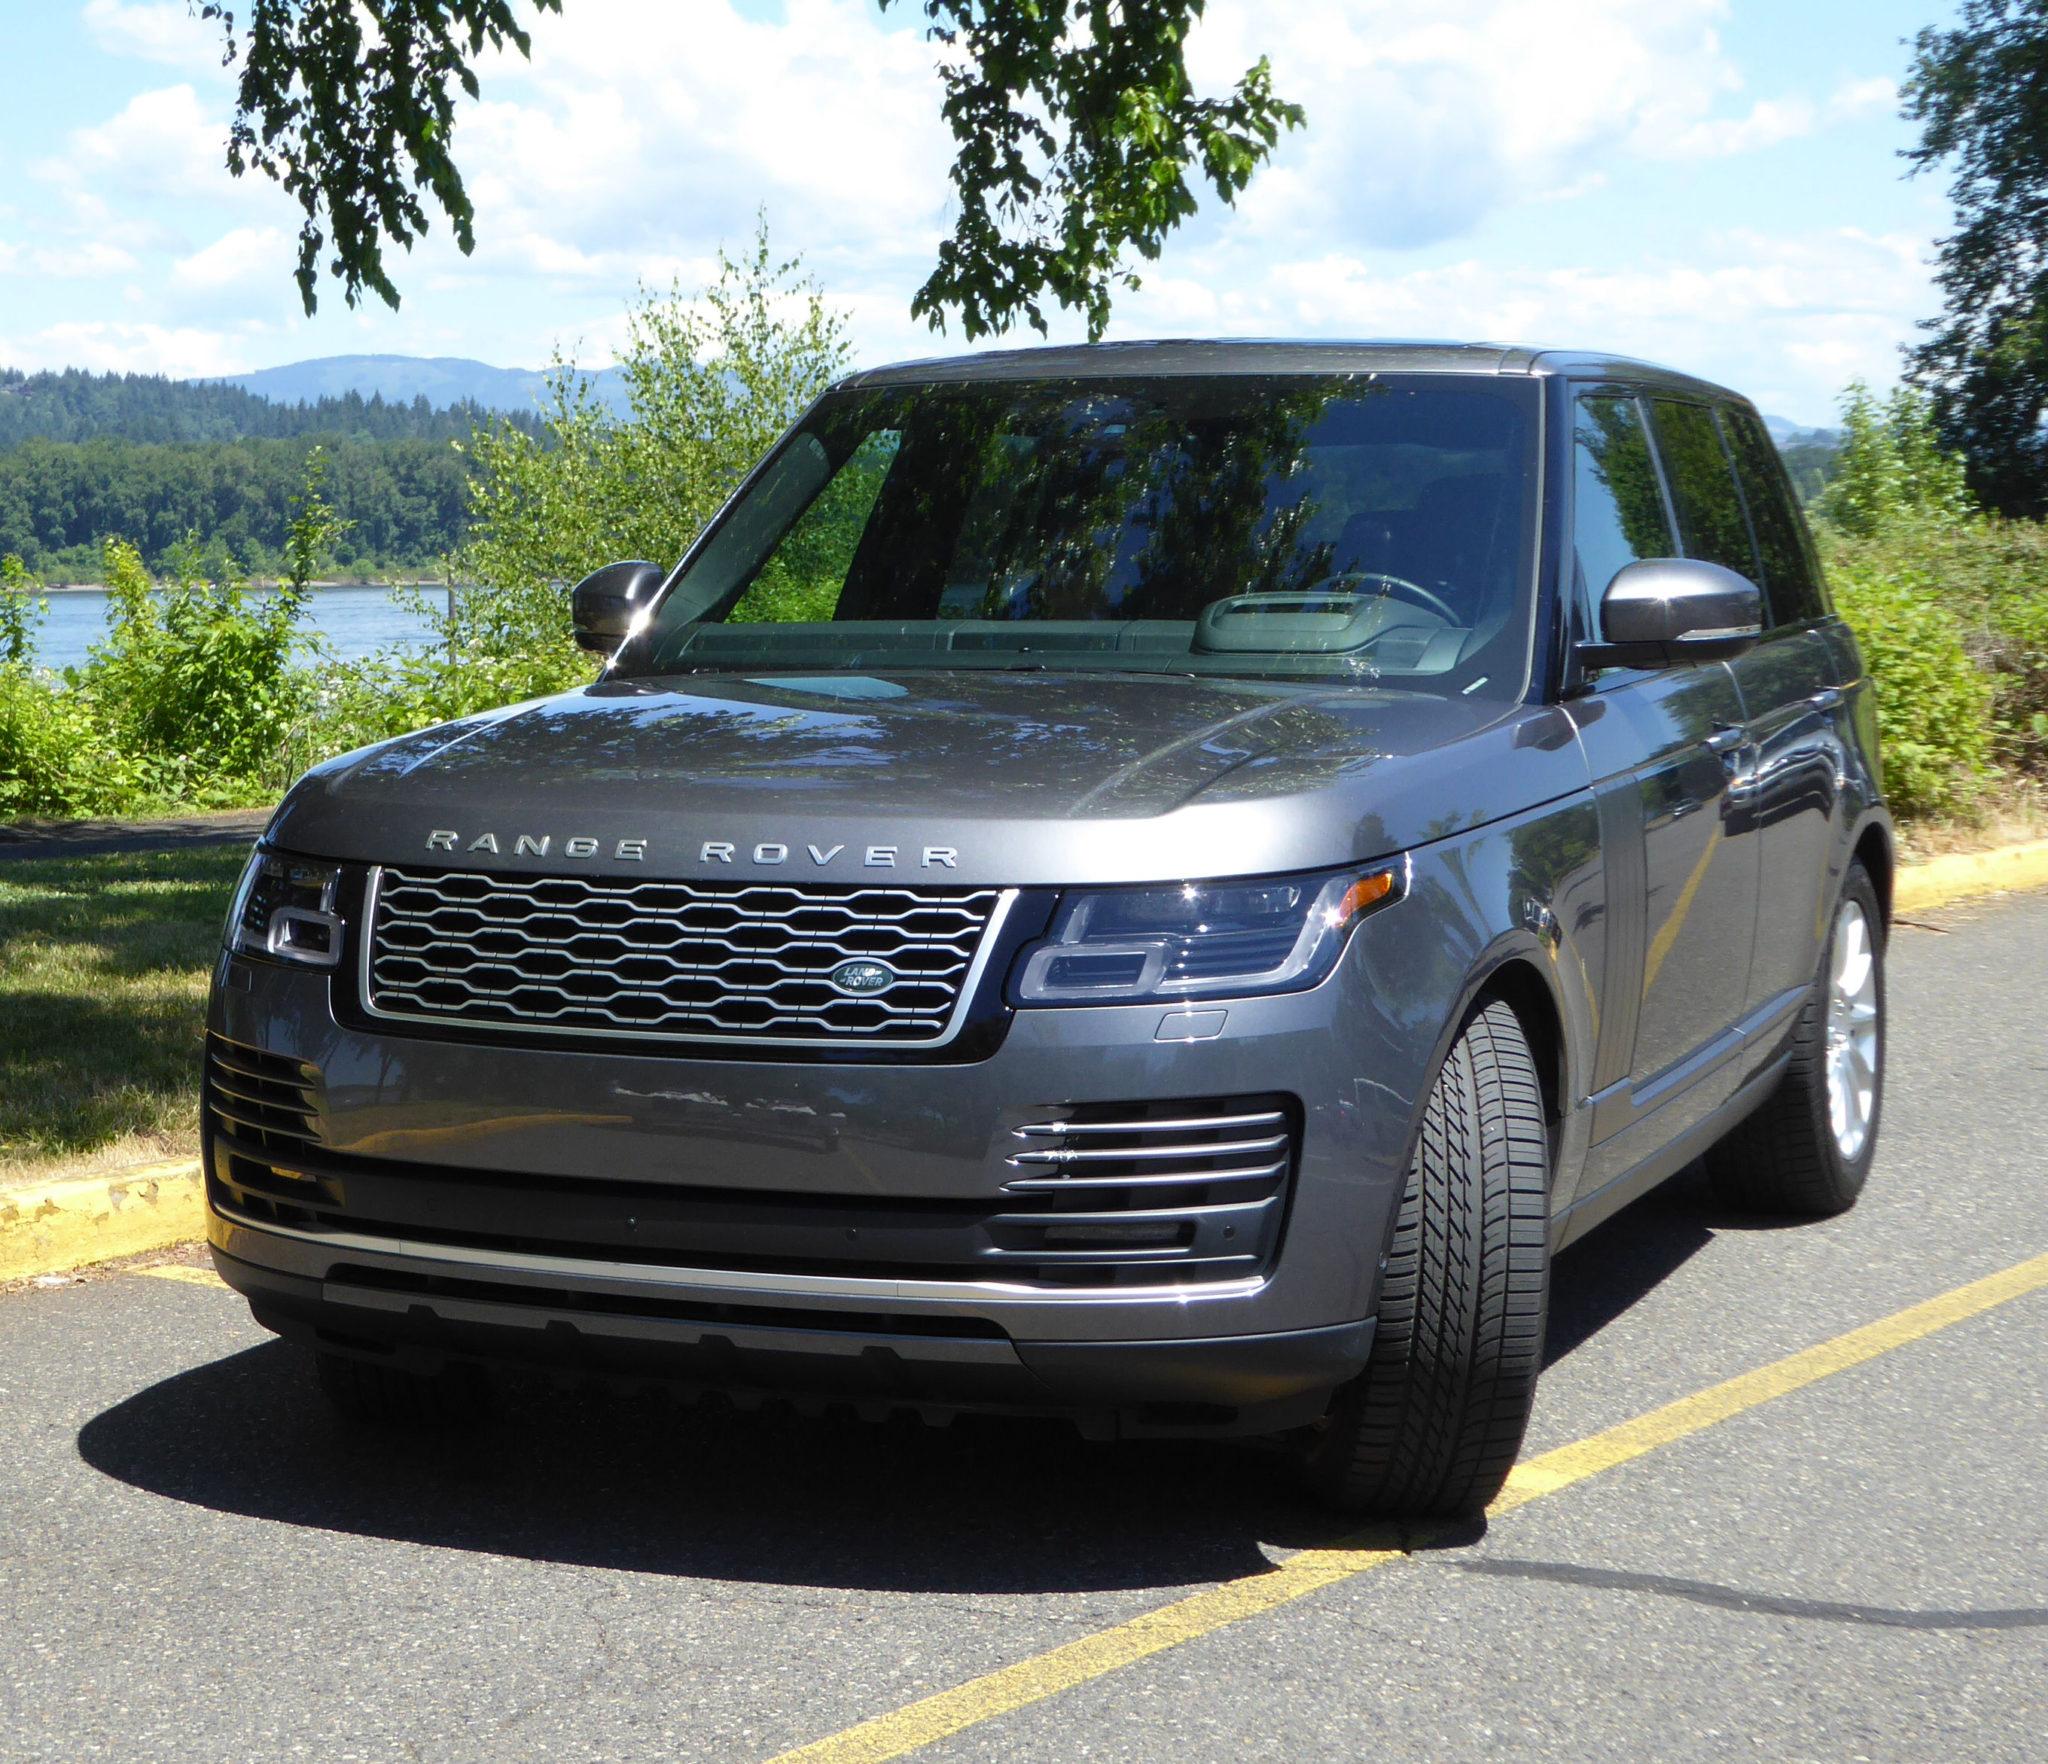 Review 2015 Range Rover Sport Hse: 2018 Range Rover HSE Diesel Test Drive